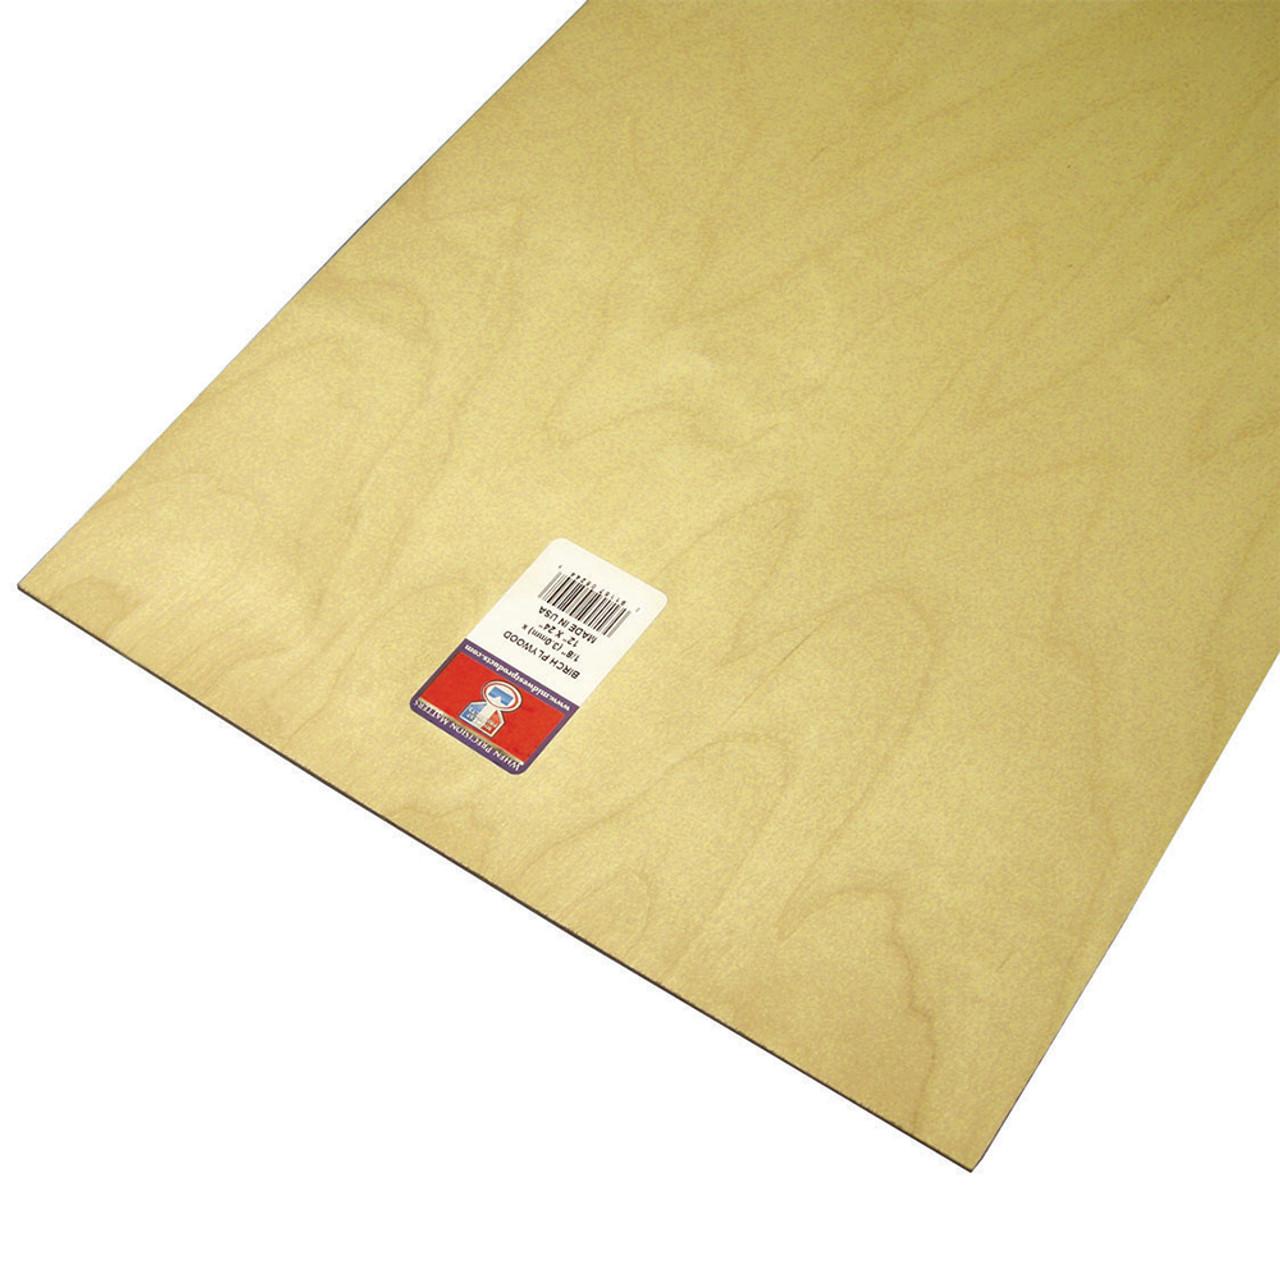 "Aircraft Grade Birch Thin Plywood Sheet .125"" x 12"" x 24"""